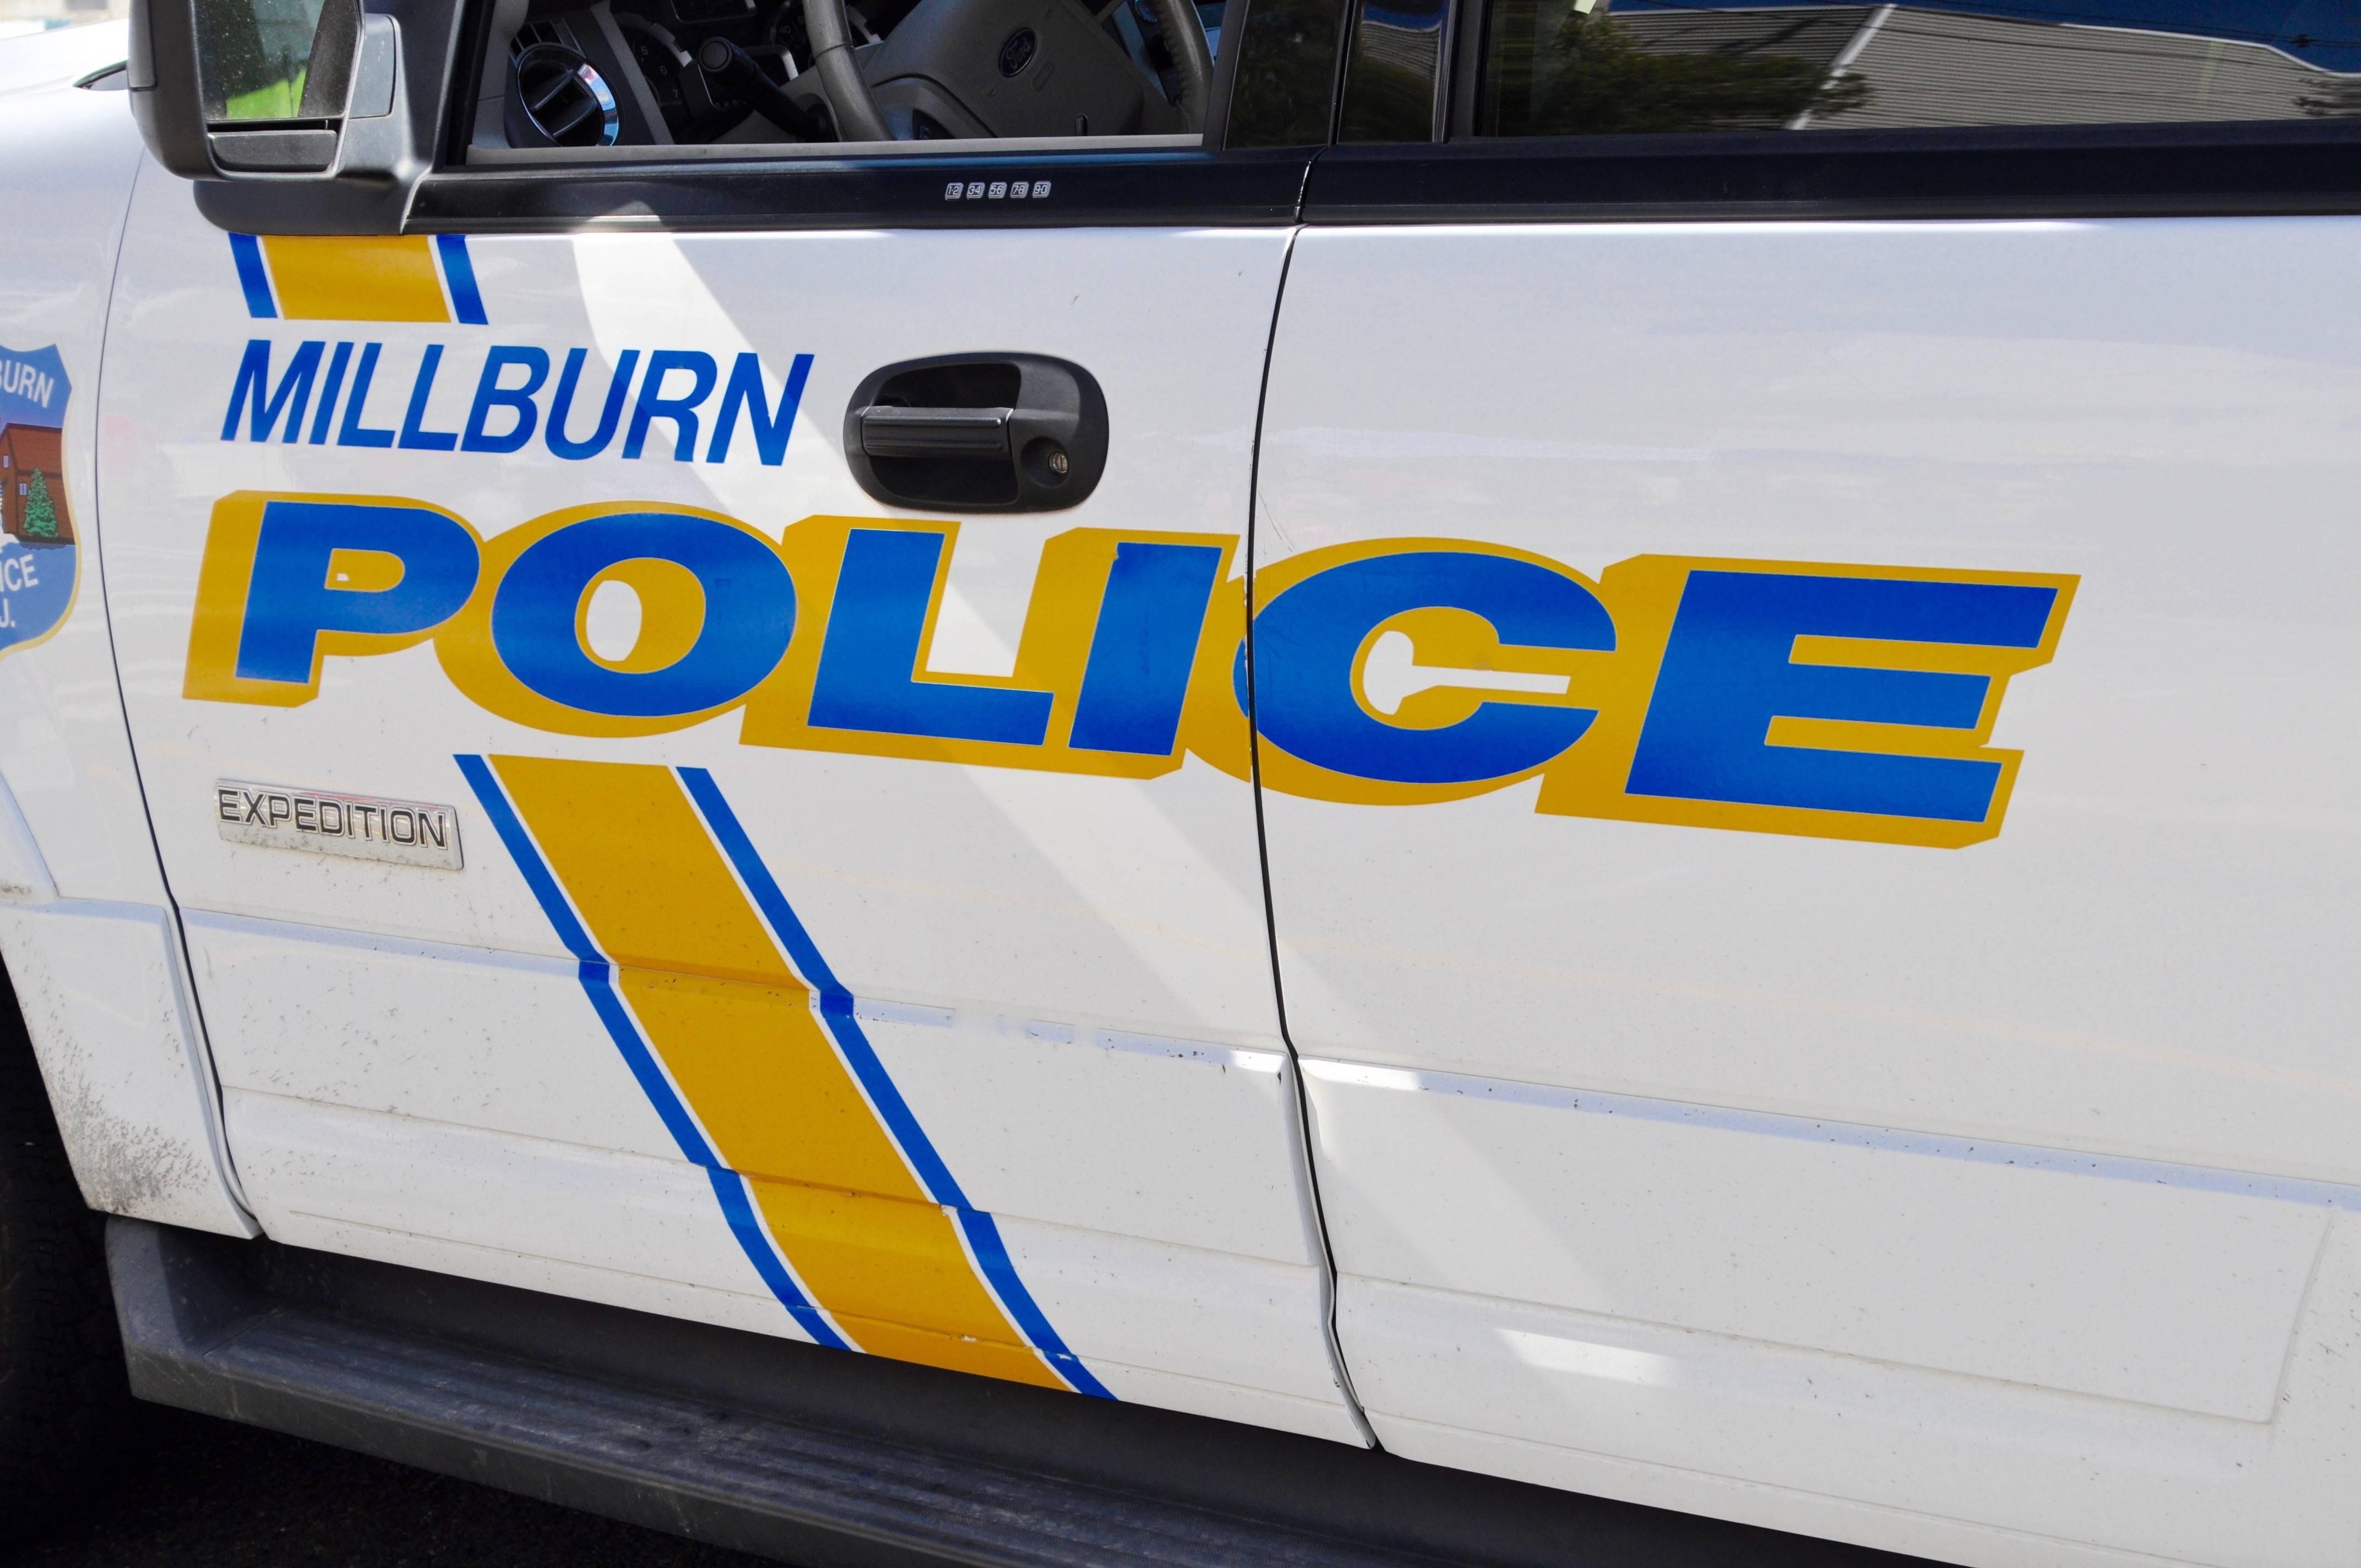 f49cf6cbaae76013a476_millburn_police_car_photo.jpg